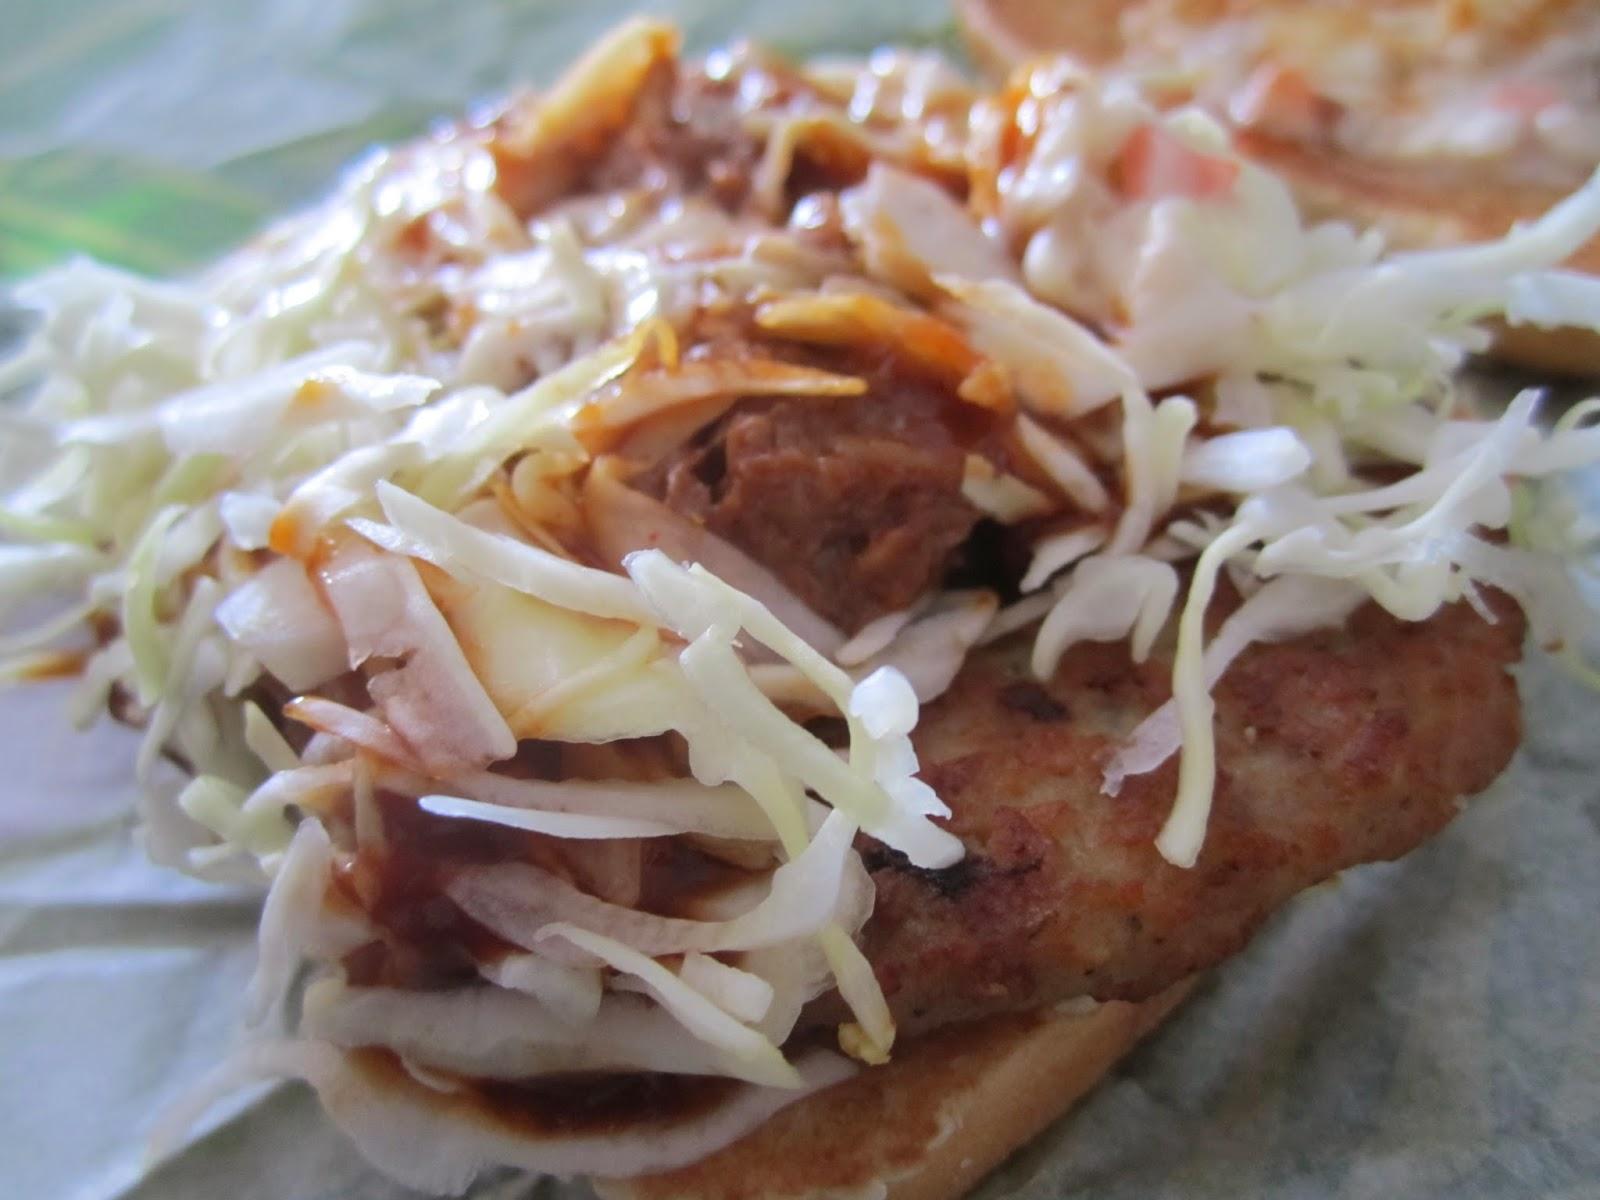 McDonald's Hawaiian BBQ Pork Burger マクドナルド ハワイアンバーベキューポークバーガー